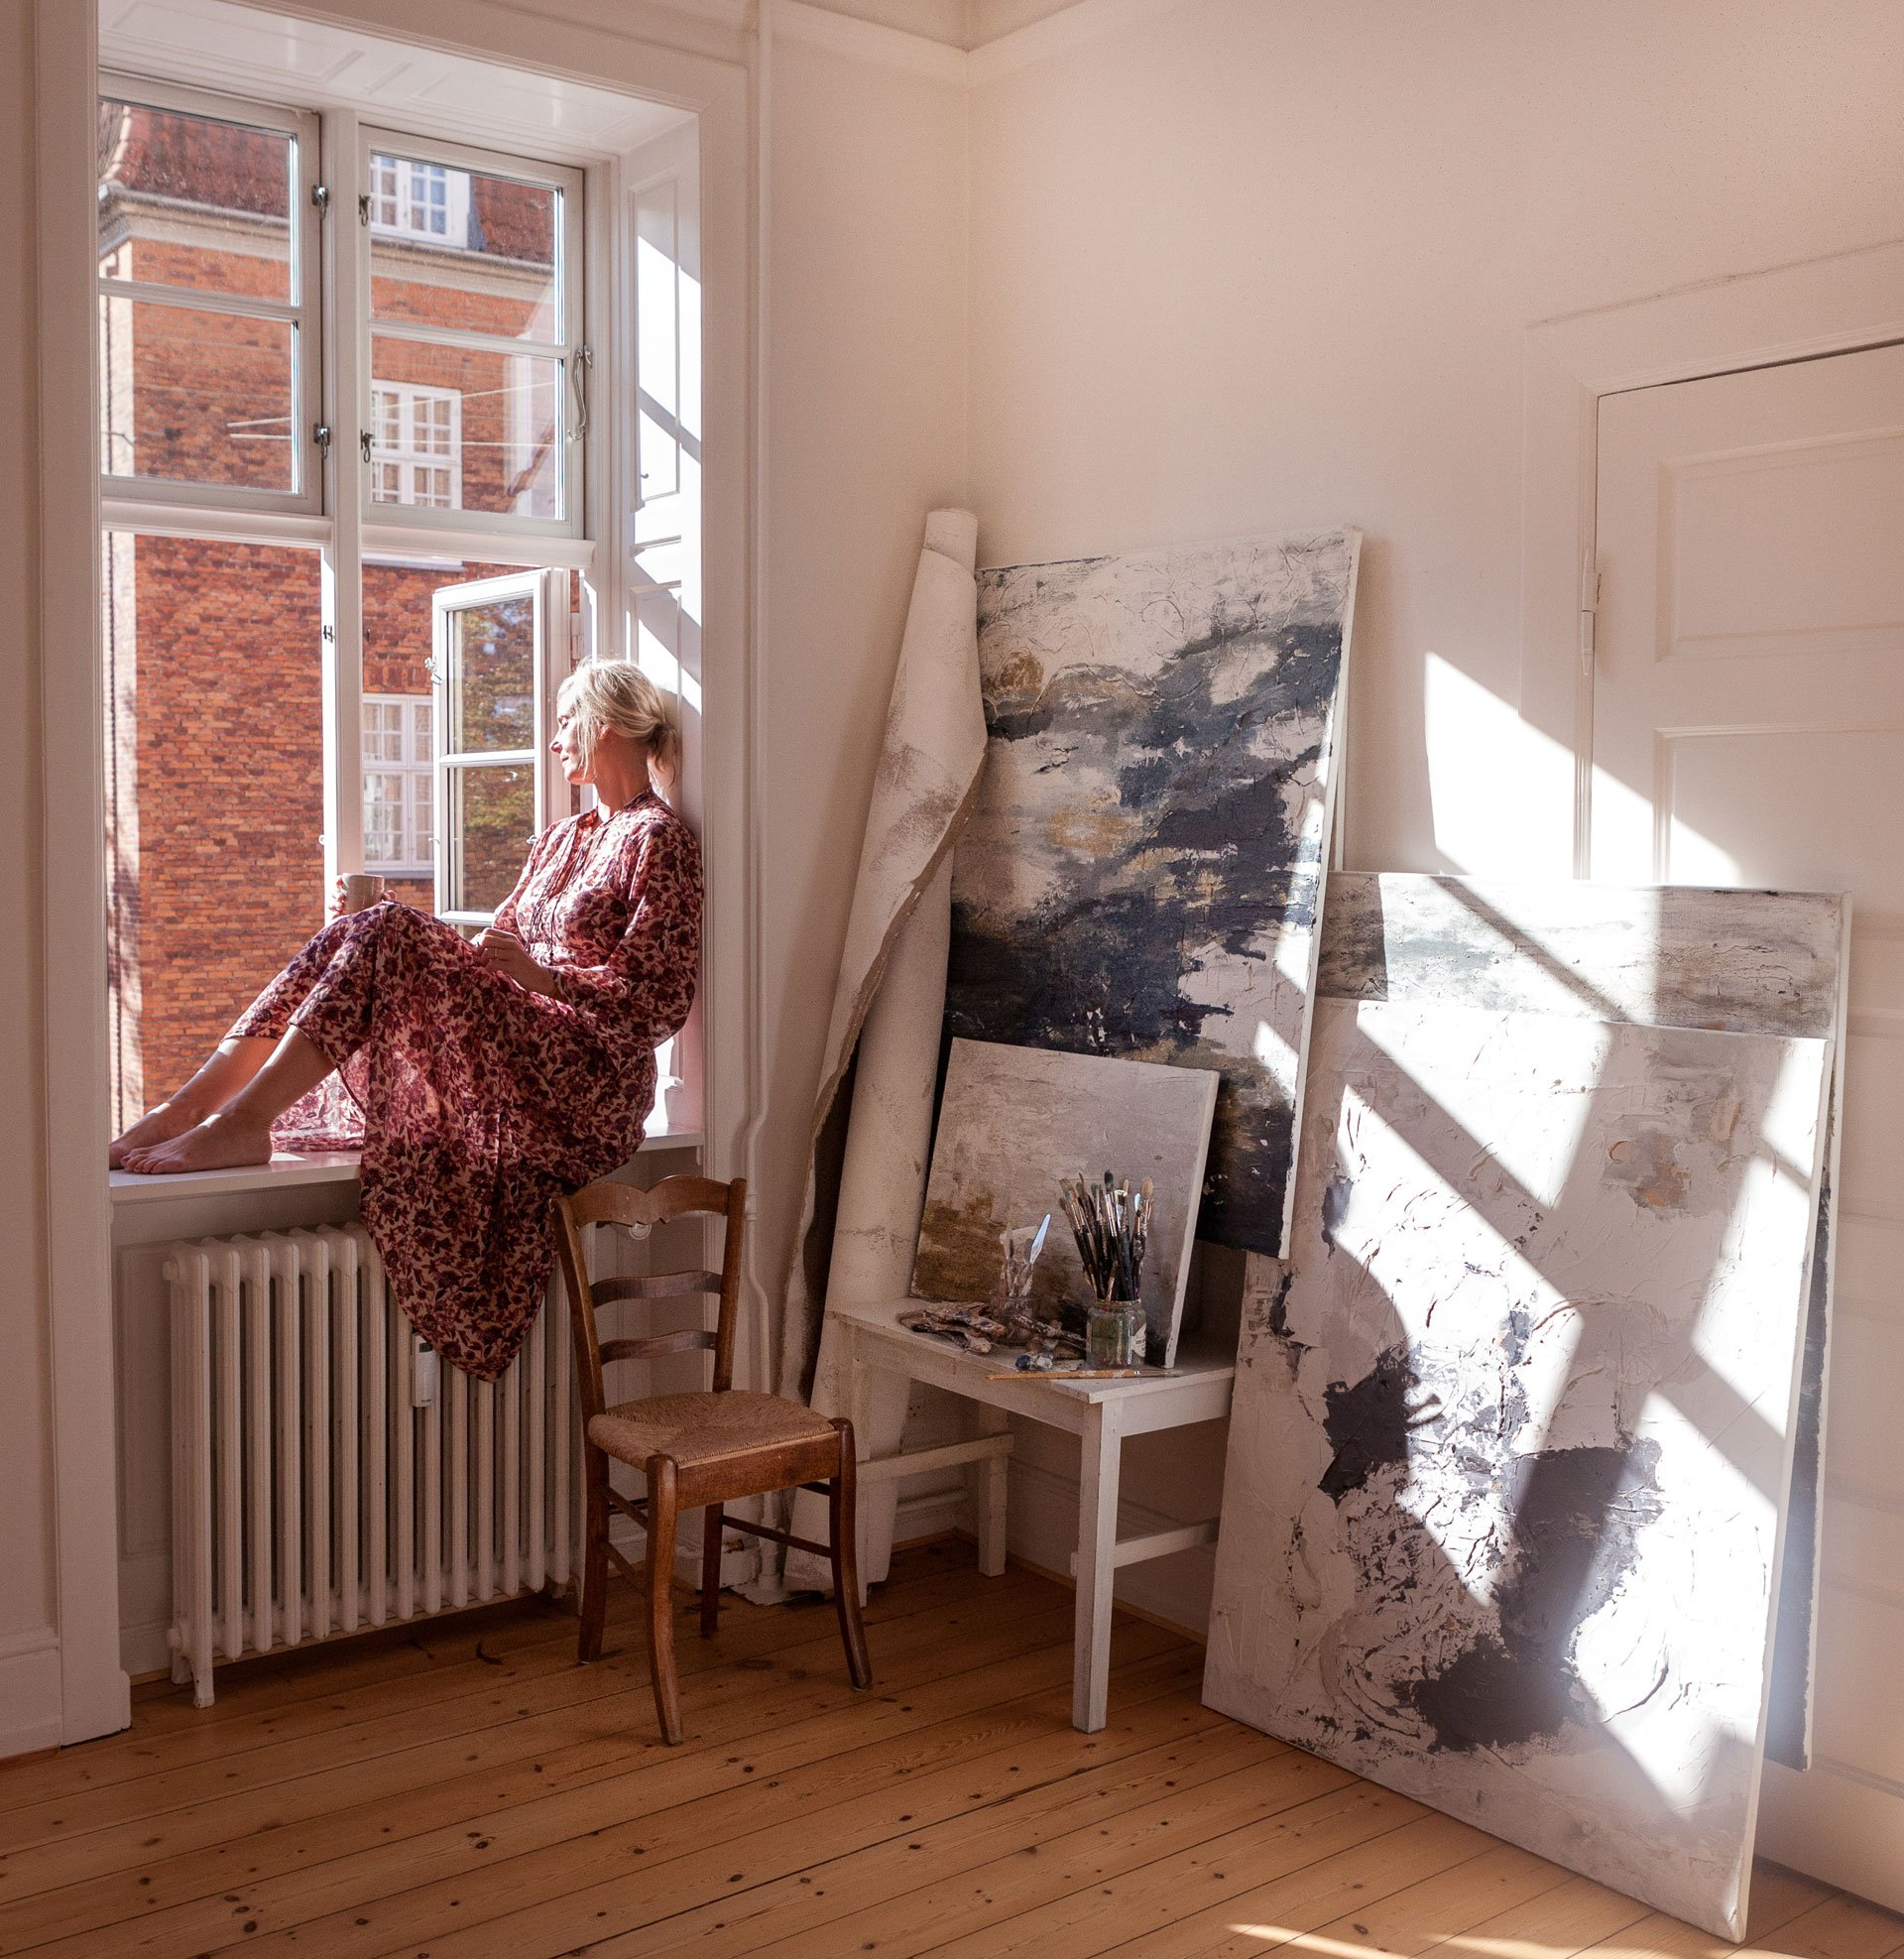 Irene de Klerk Wolters abstract artist